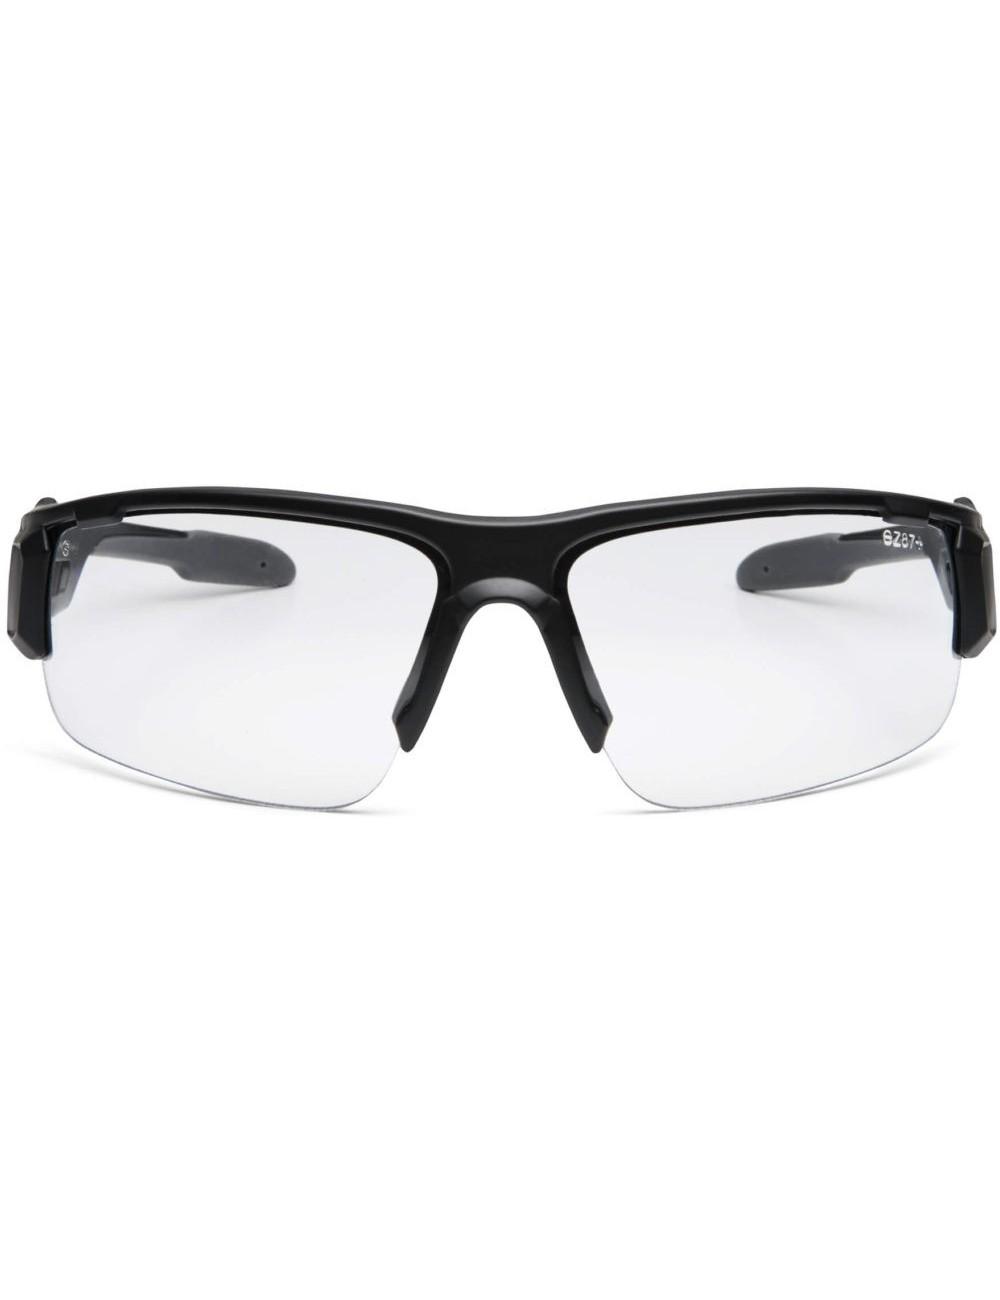 Okulary ochronne Ergodyne Skullerz® Dagr Anti Fog